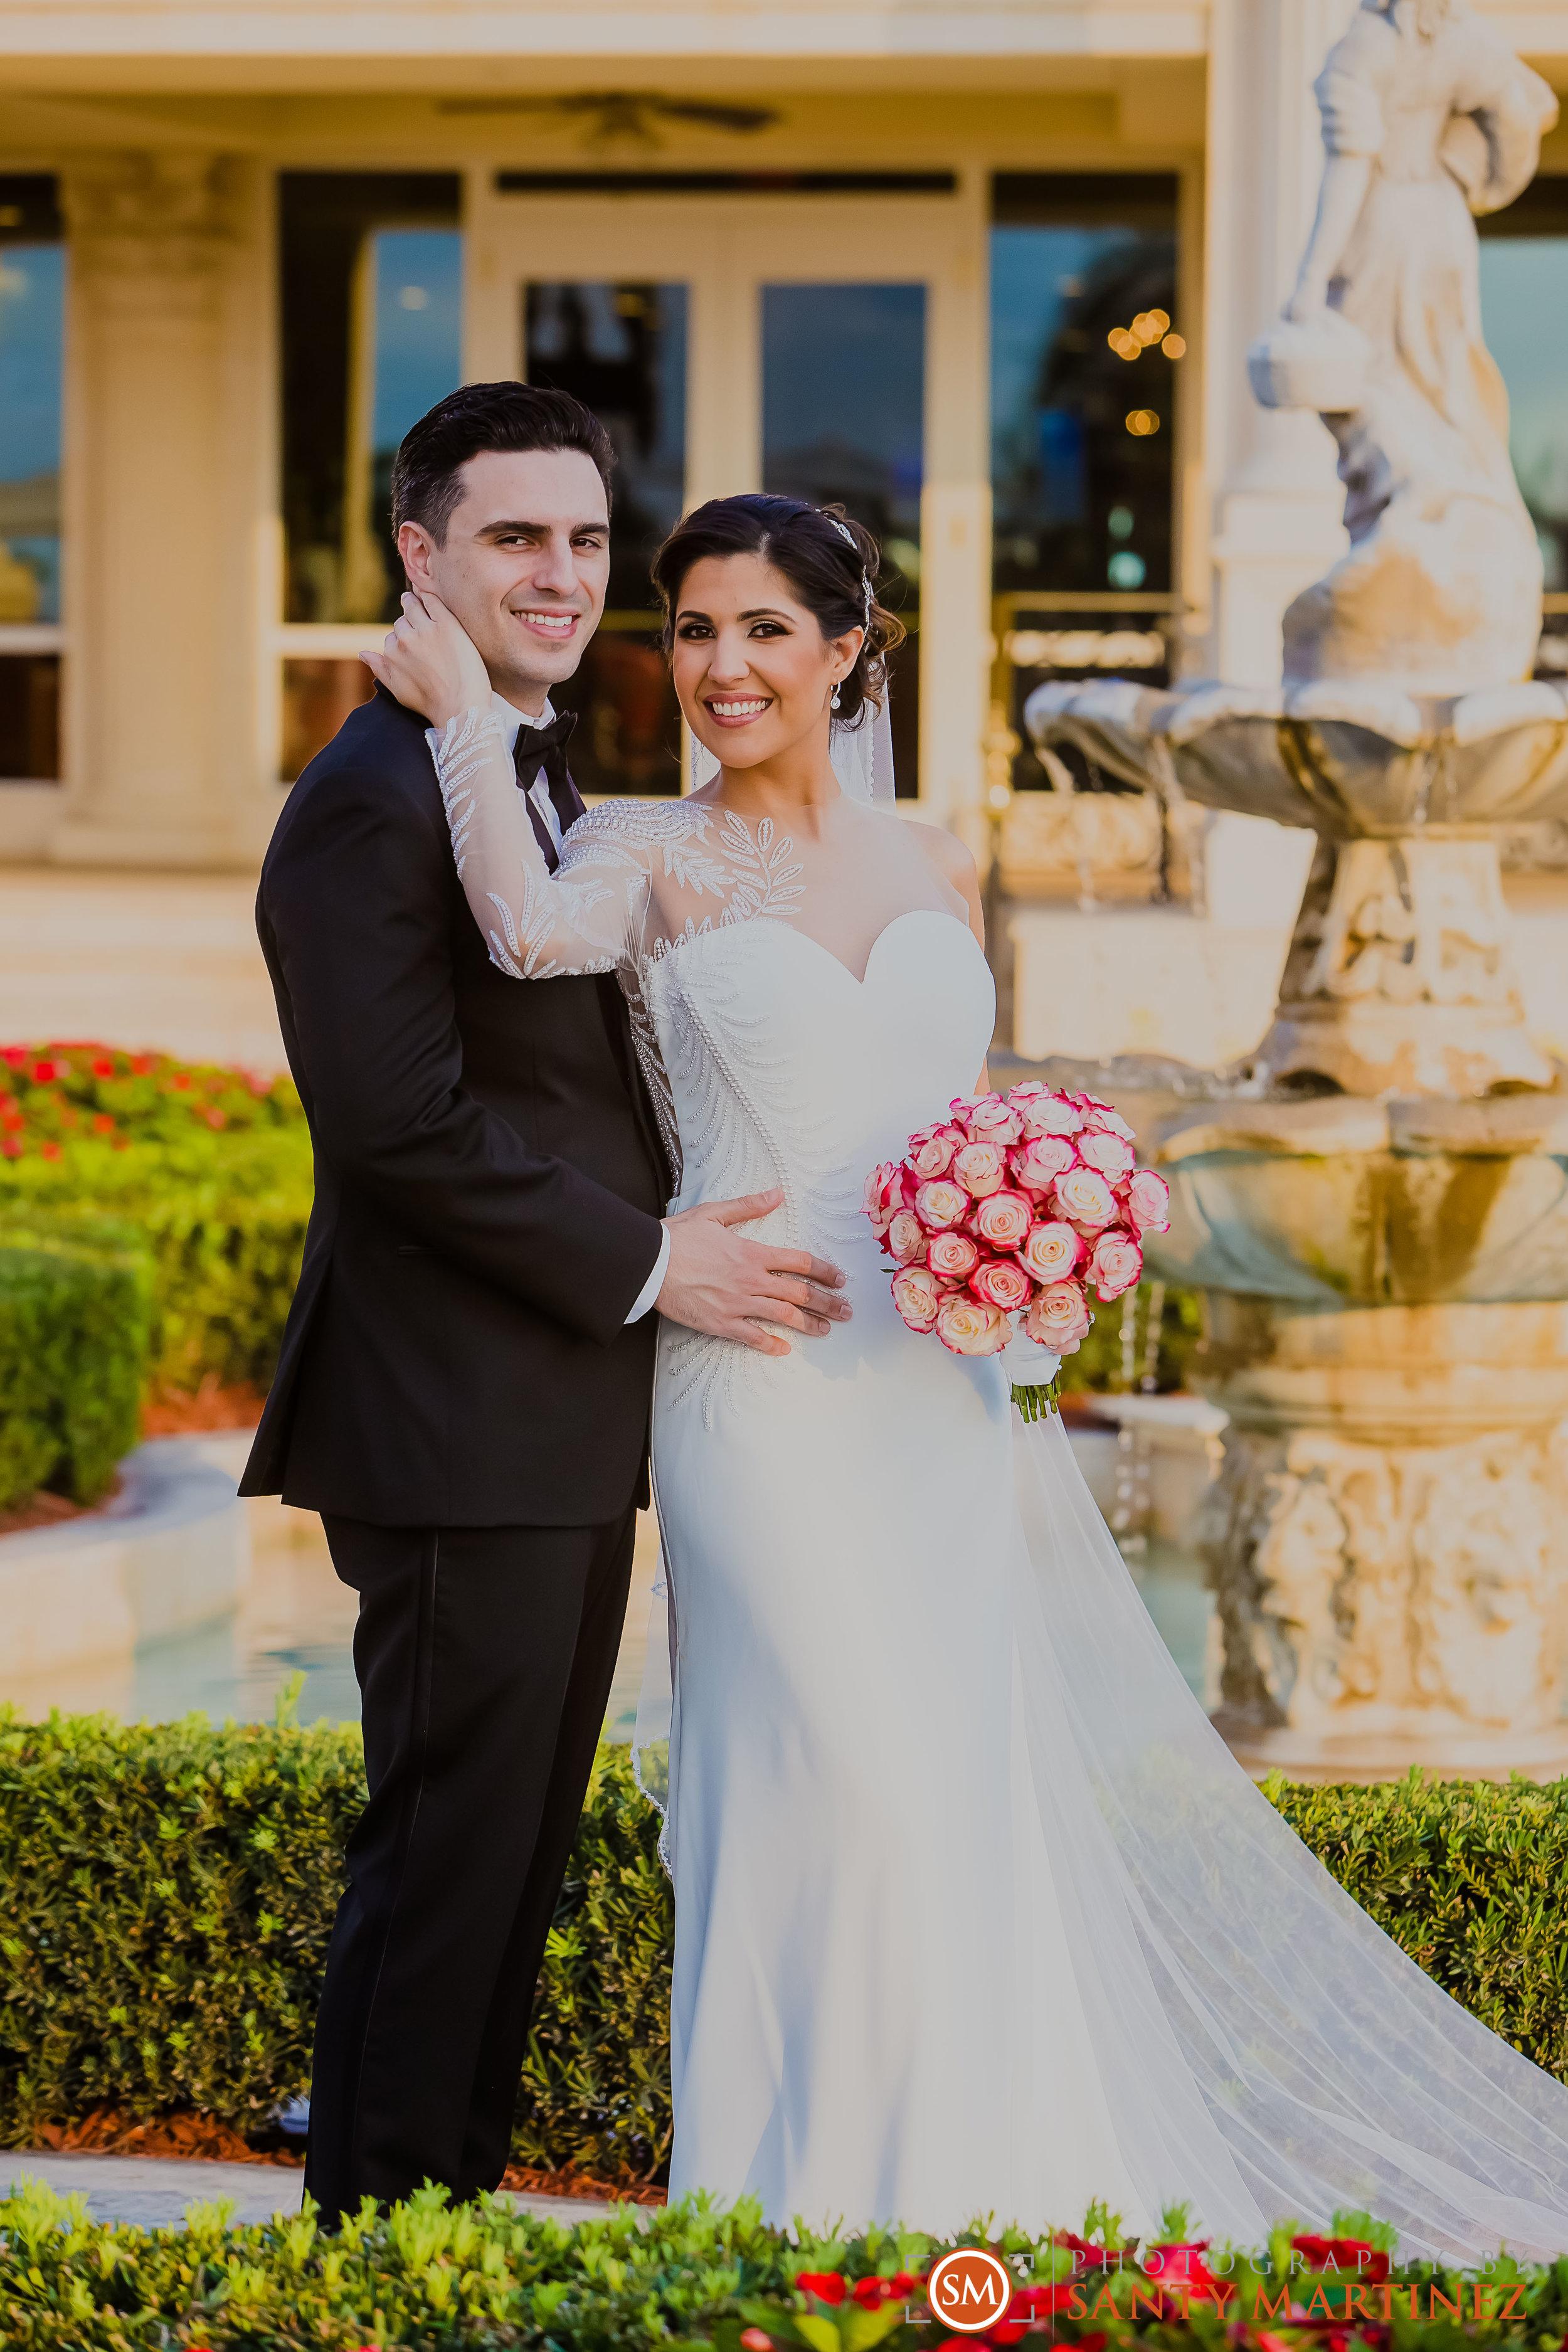 Wedding Trump National Doral Miami - Santy Martinez Photography-2.jpg